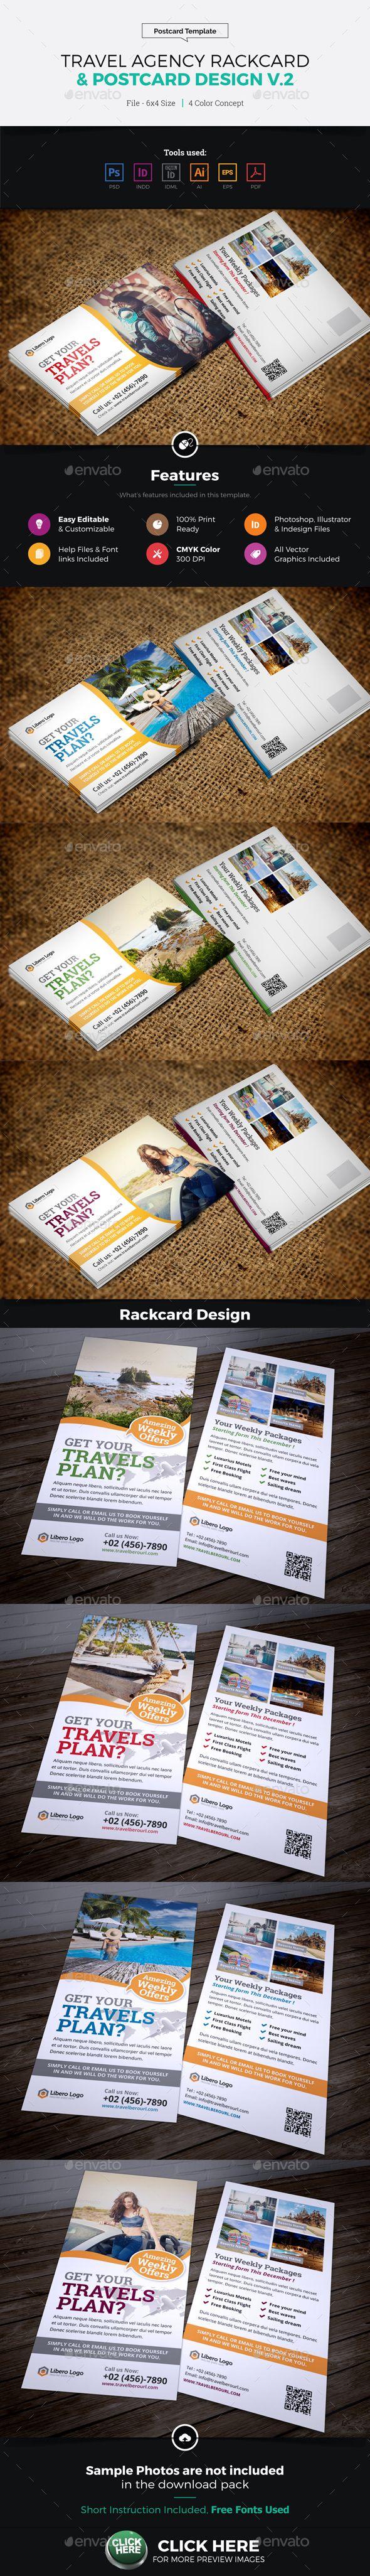 Travel Postcard Rackcard DL Flyer Design Template PSD, Vector EPS, InDesign INDD, AI Illustrator